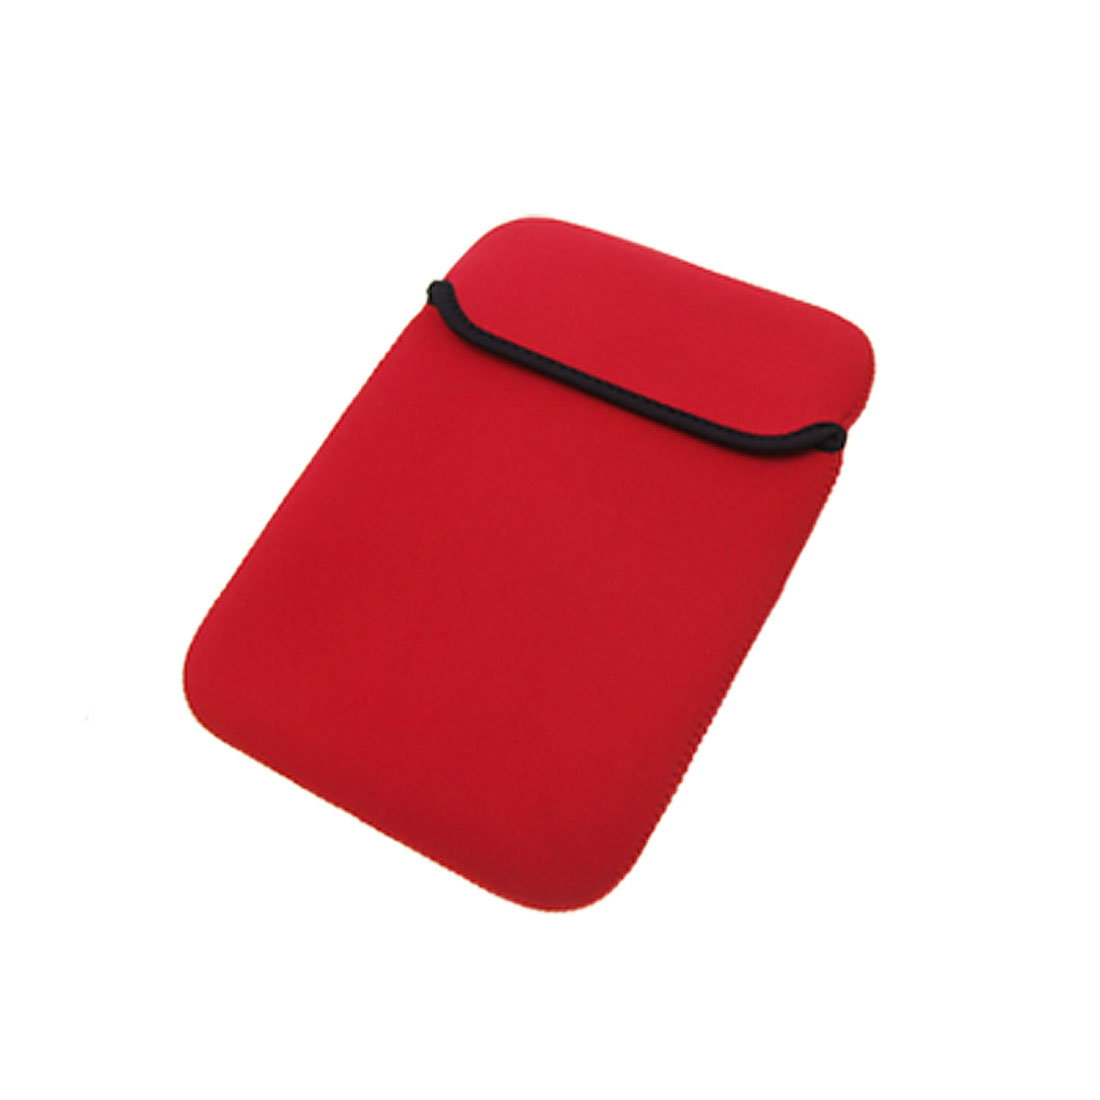 "10"" 10.1"" 10.2"" Red Neoprene Notebook Laptop Sleeve Bag Case"